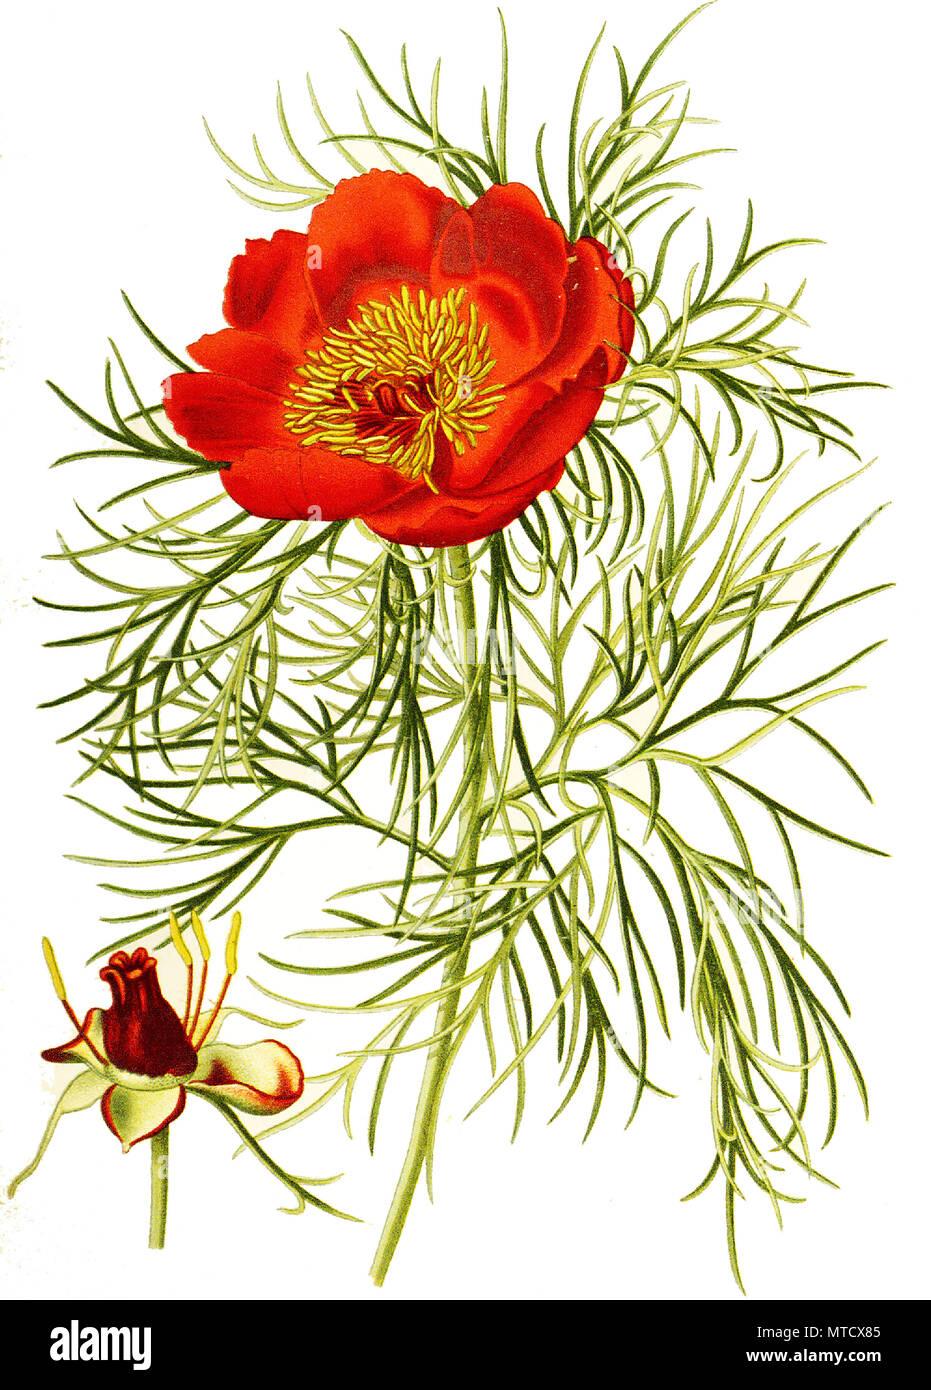 Paeonia tenuifolia, Narrow-Leaved Peony. Gemeine Pfingstrose, auch Echte Pfingstrose, Bauern-Pfingstrose, Garten-Pfingstrose, digital improved reproduction from a print of the 19th century Stock Photo